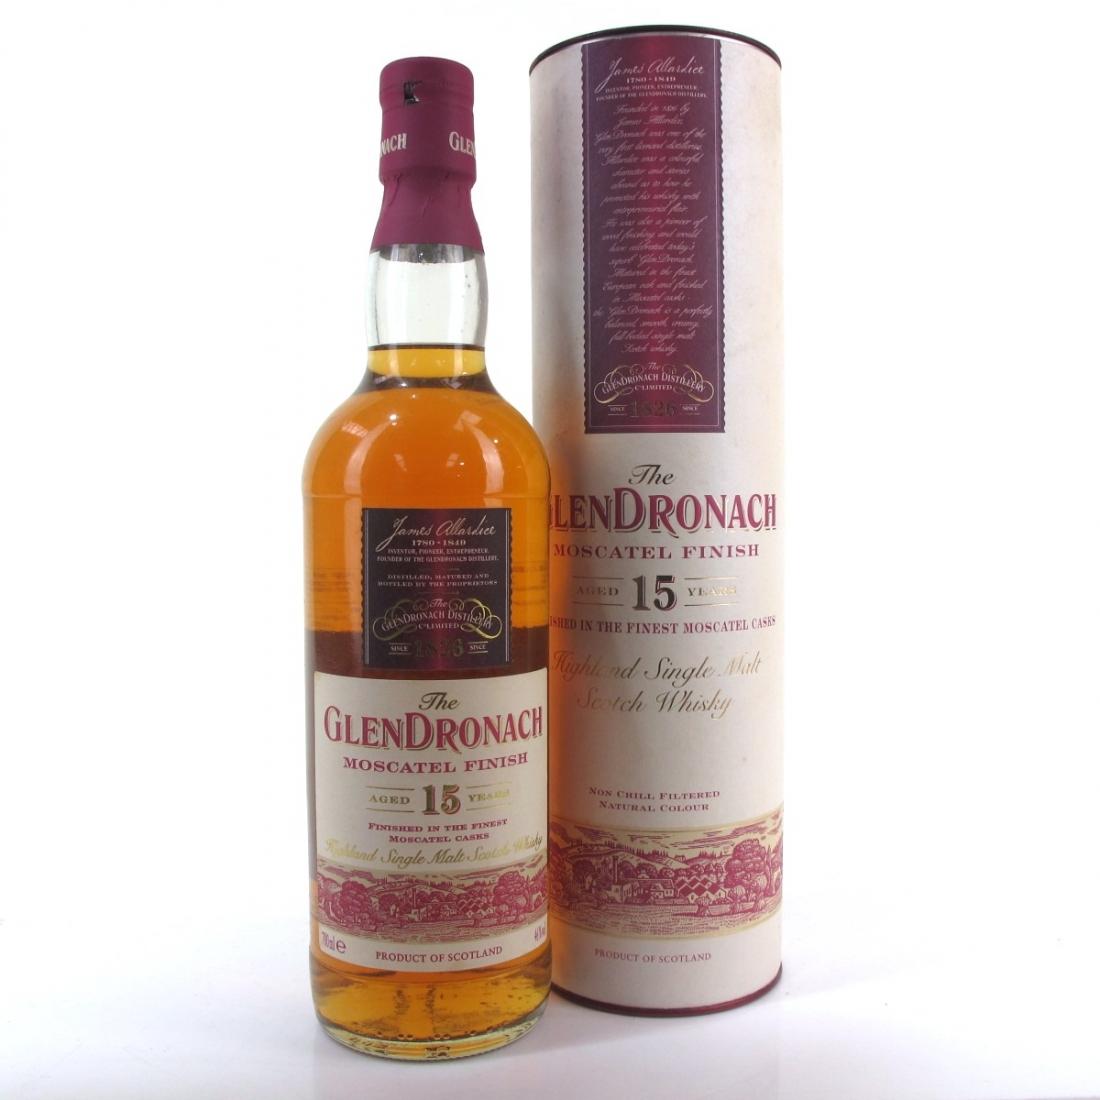 Glendronach 15 Year Old Moscatel Finish